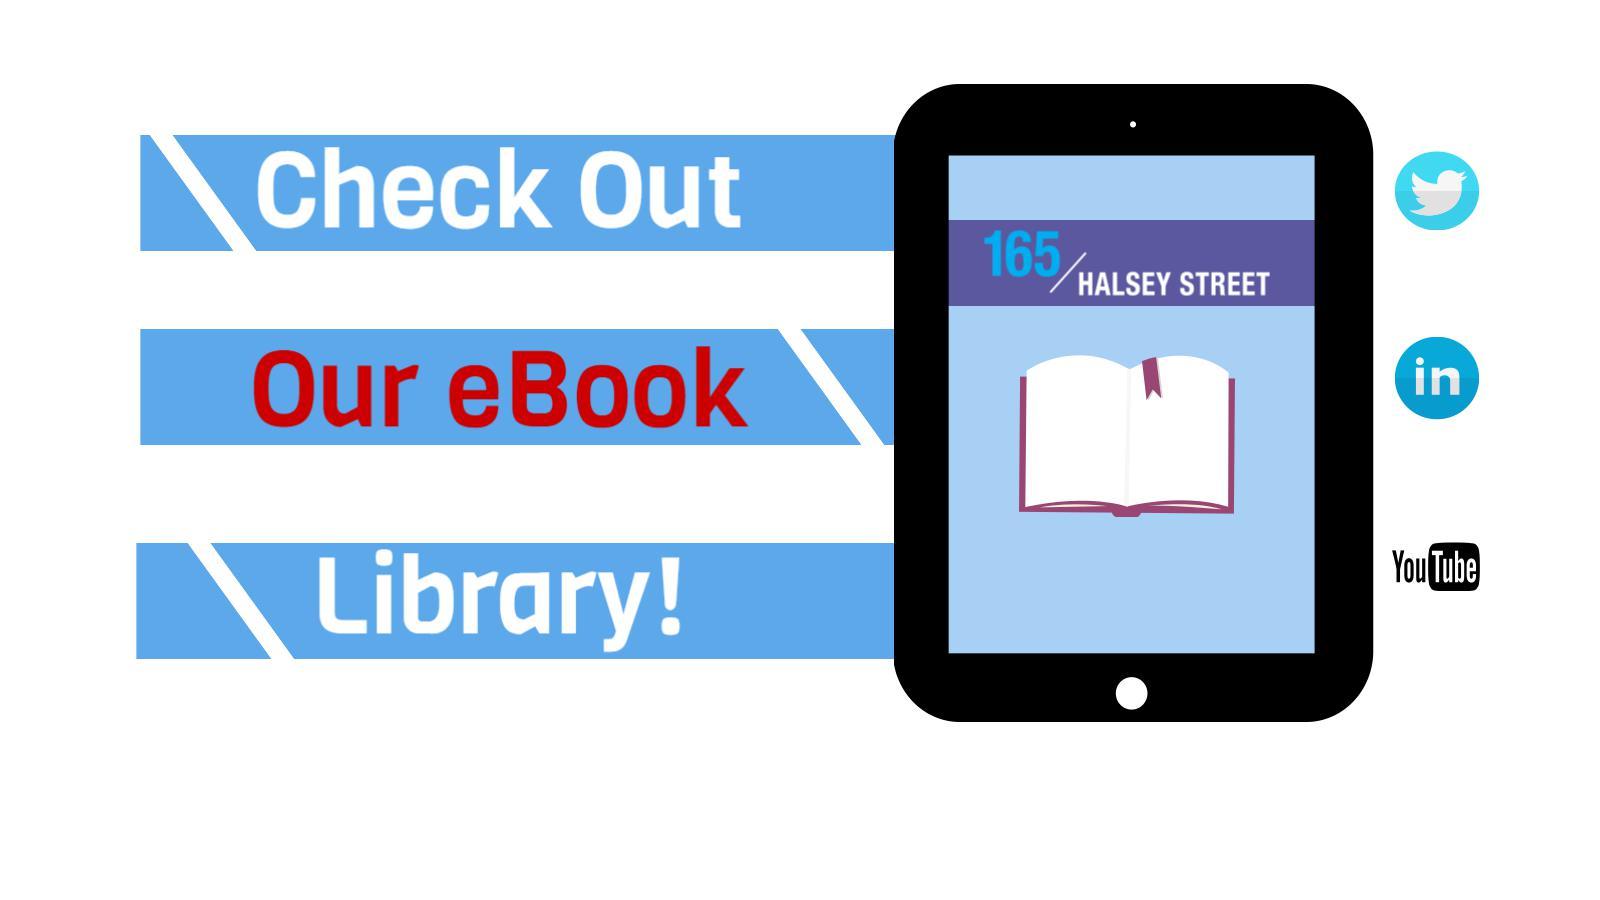 165-halsey-ebook-library-image